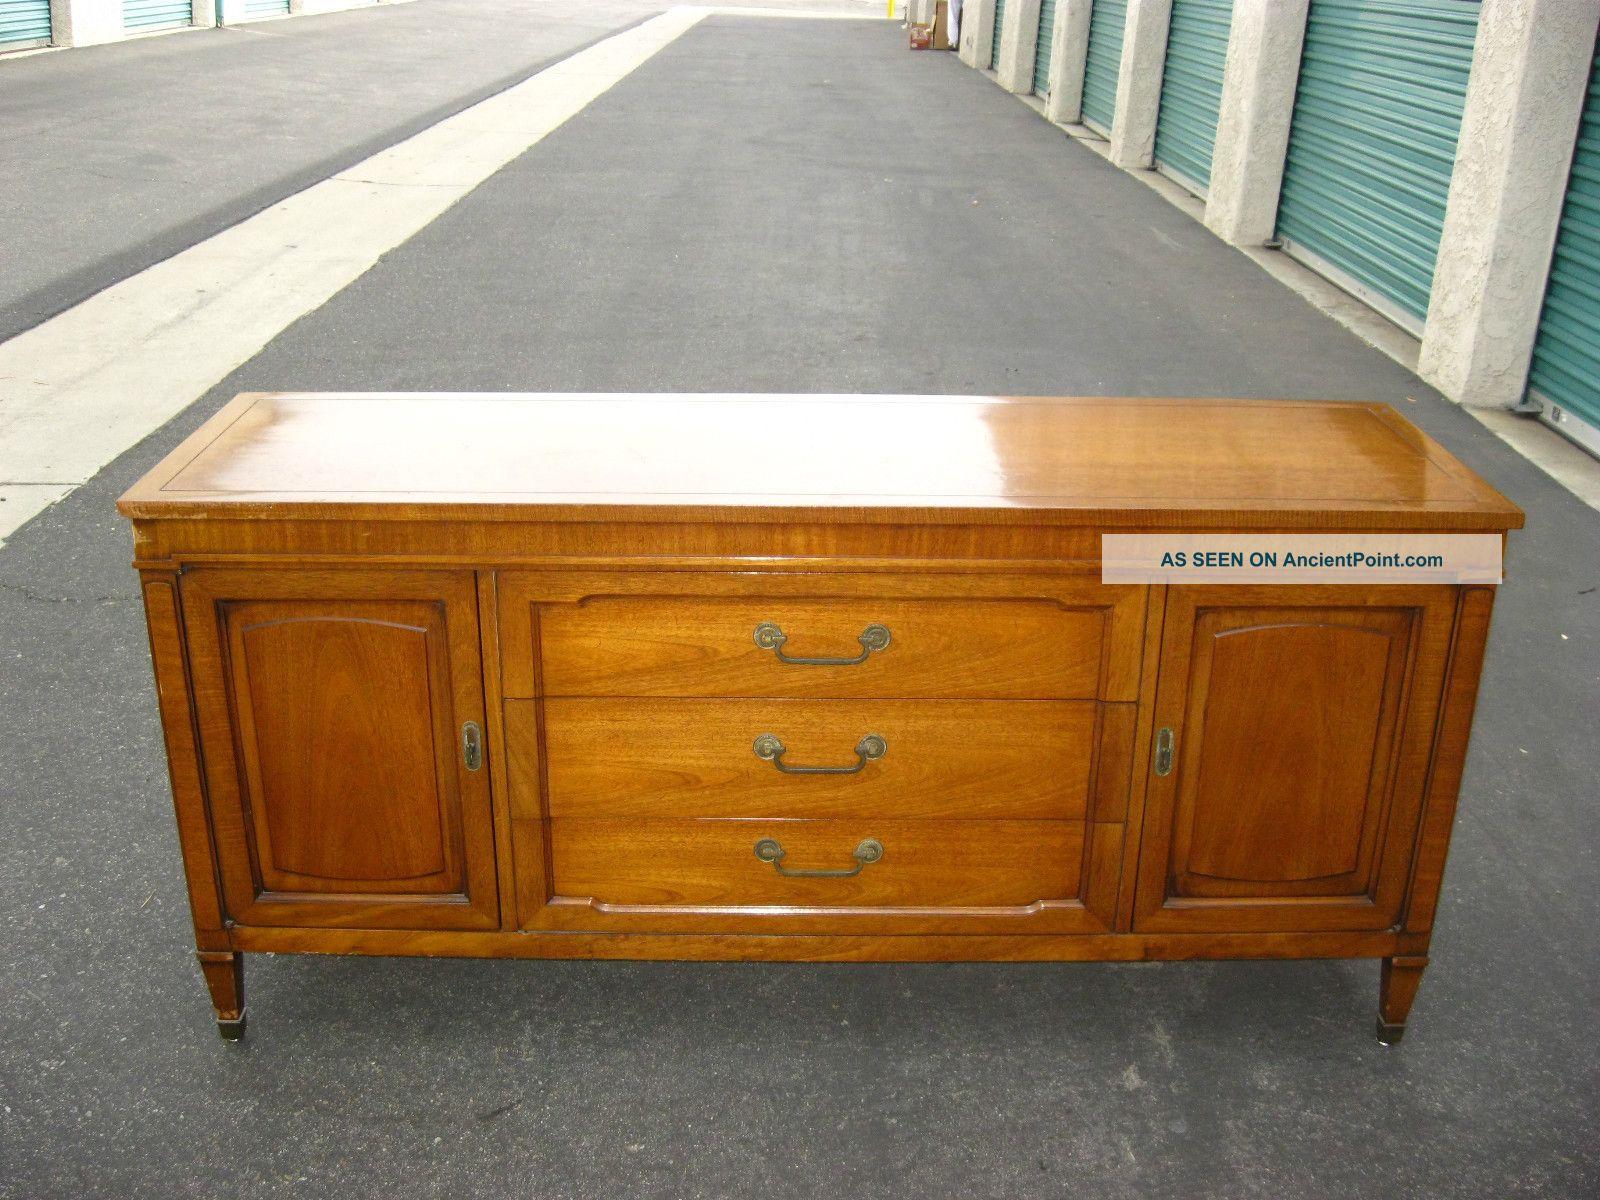 Drexel Vintage Mid Century Modern Low Profile Credenza Sideboard Plasmatv Stand Post-1950 photo